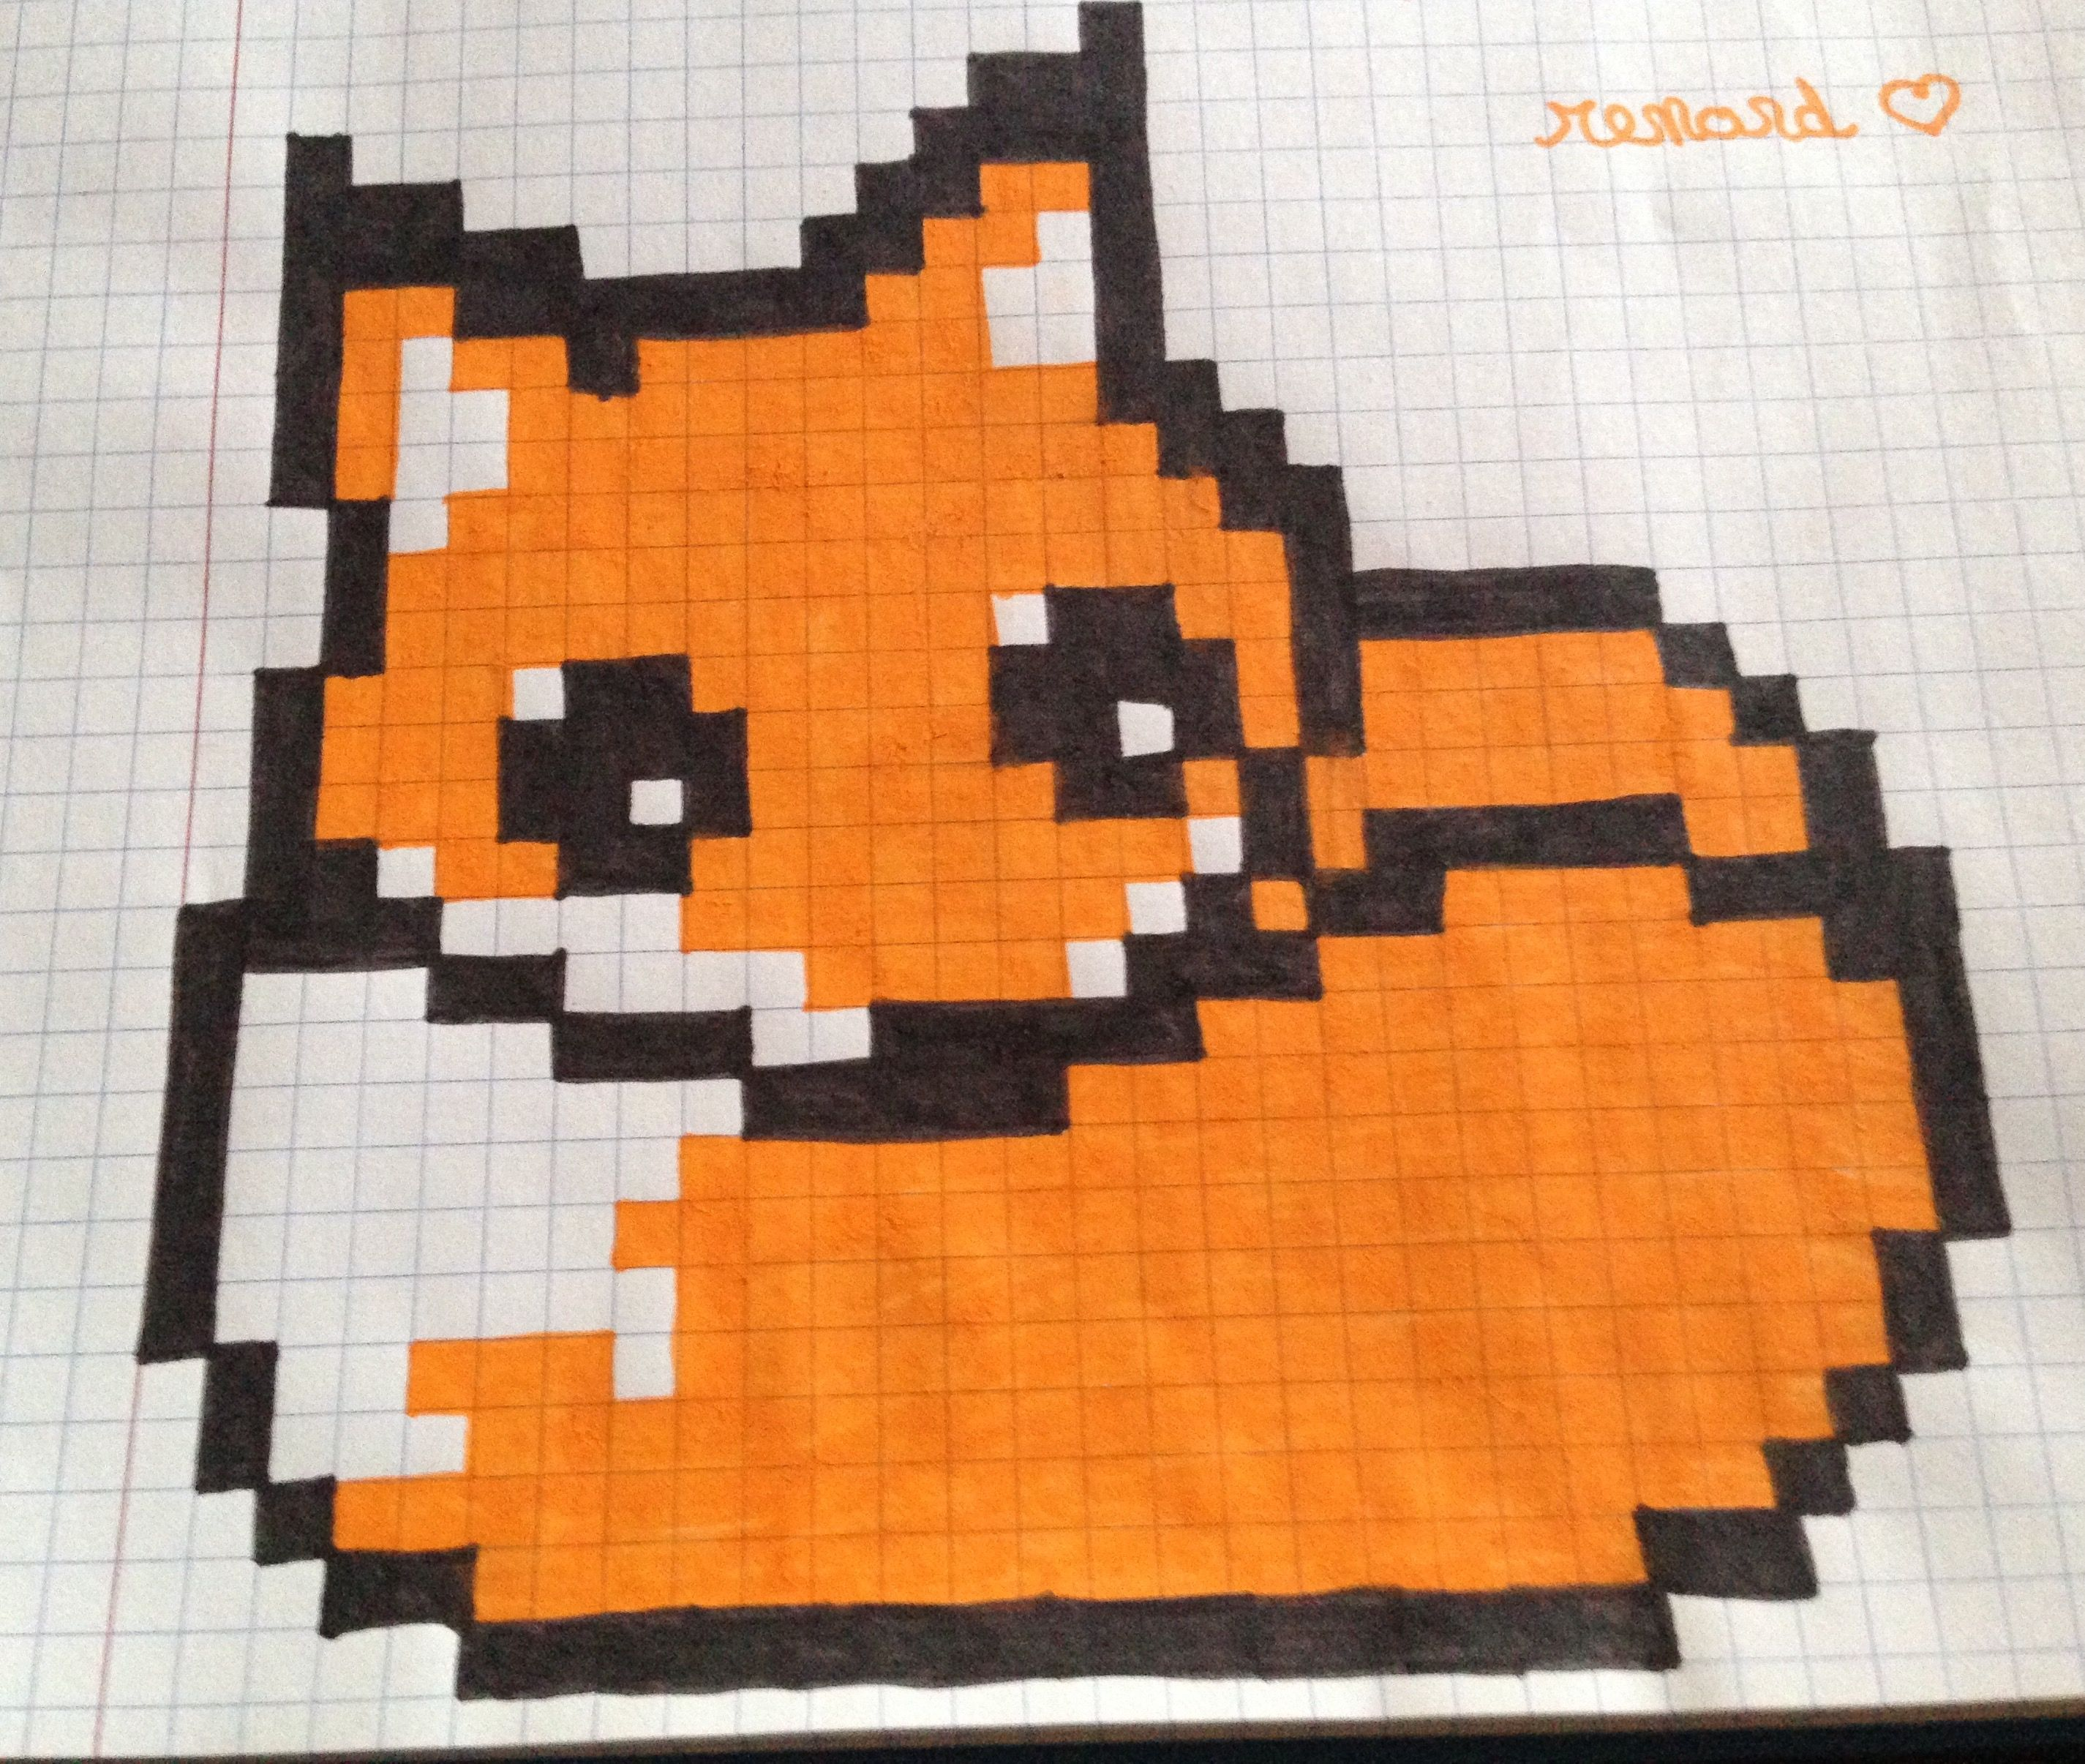 Renard kawai mes pixel art pinterest - Dessin renard ...